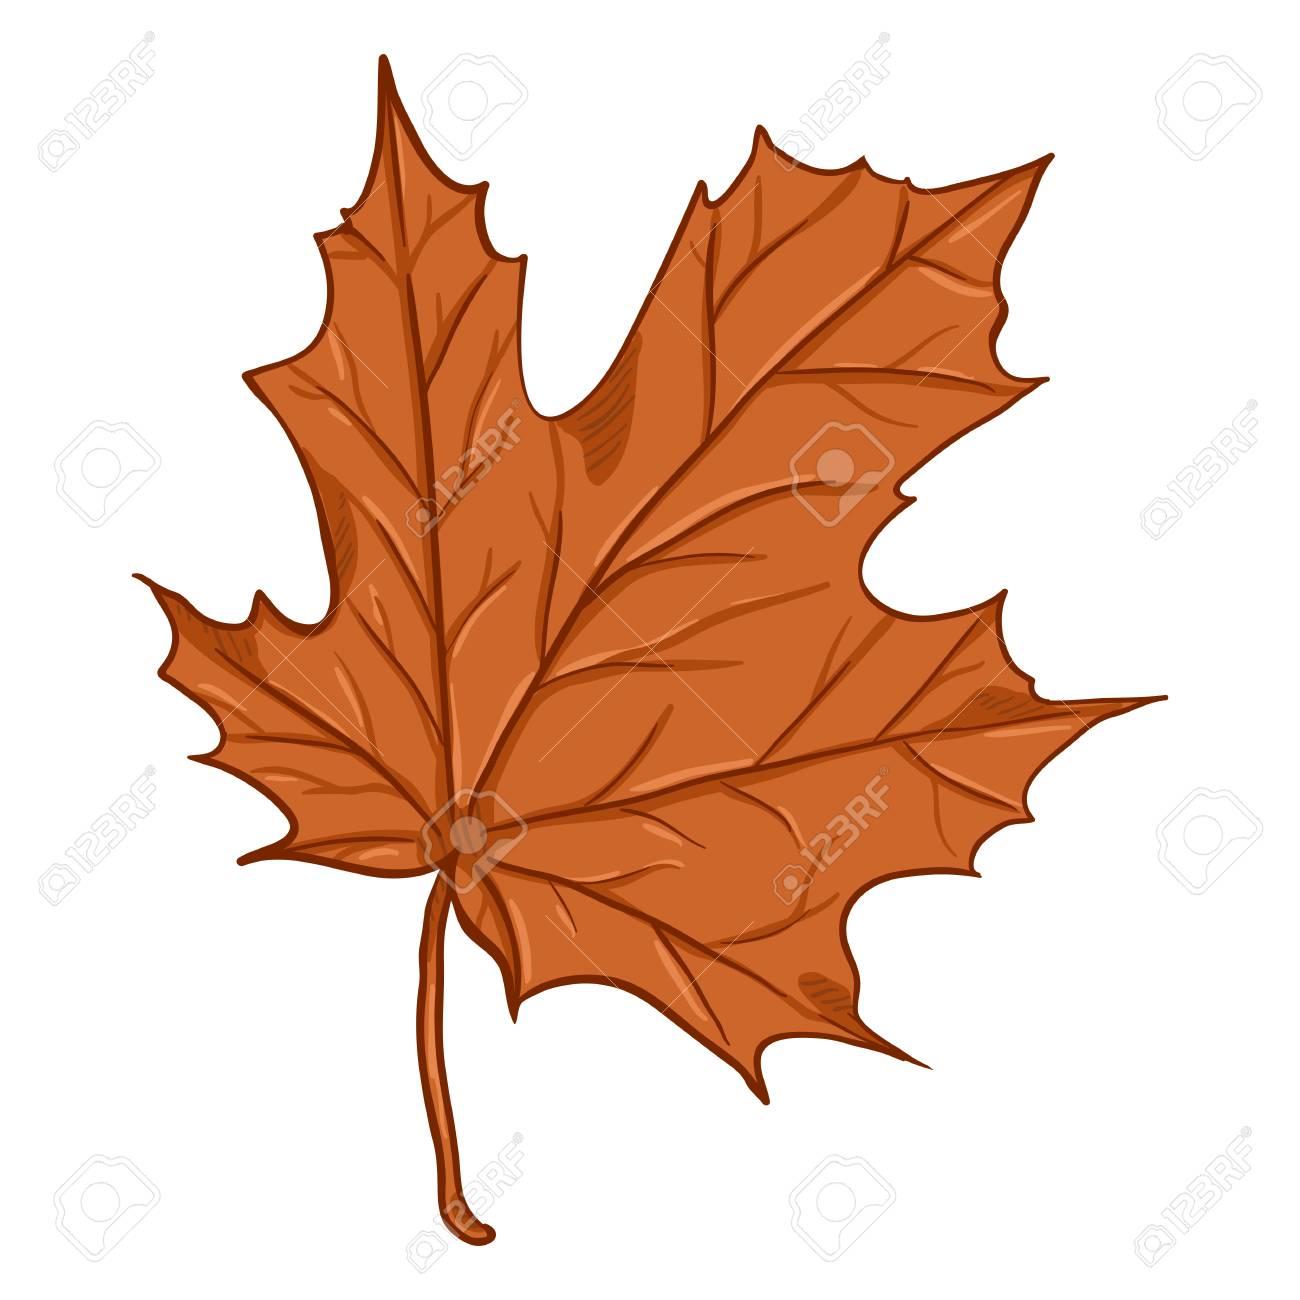 Vector Cartoon Illustration Autumn Fallen Orange Leaf Of Maple Royalty Free Cliparts Vectors And Stock Illustration Image 105440147